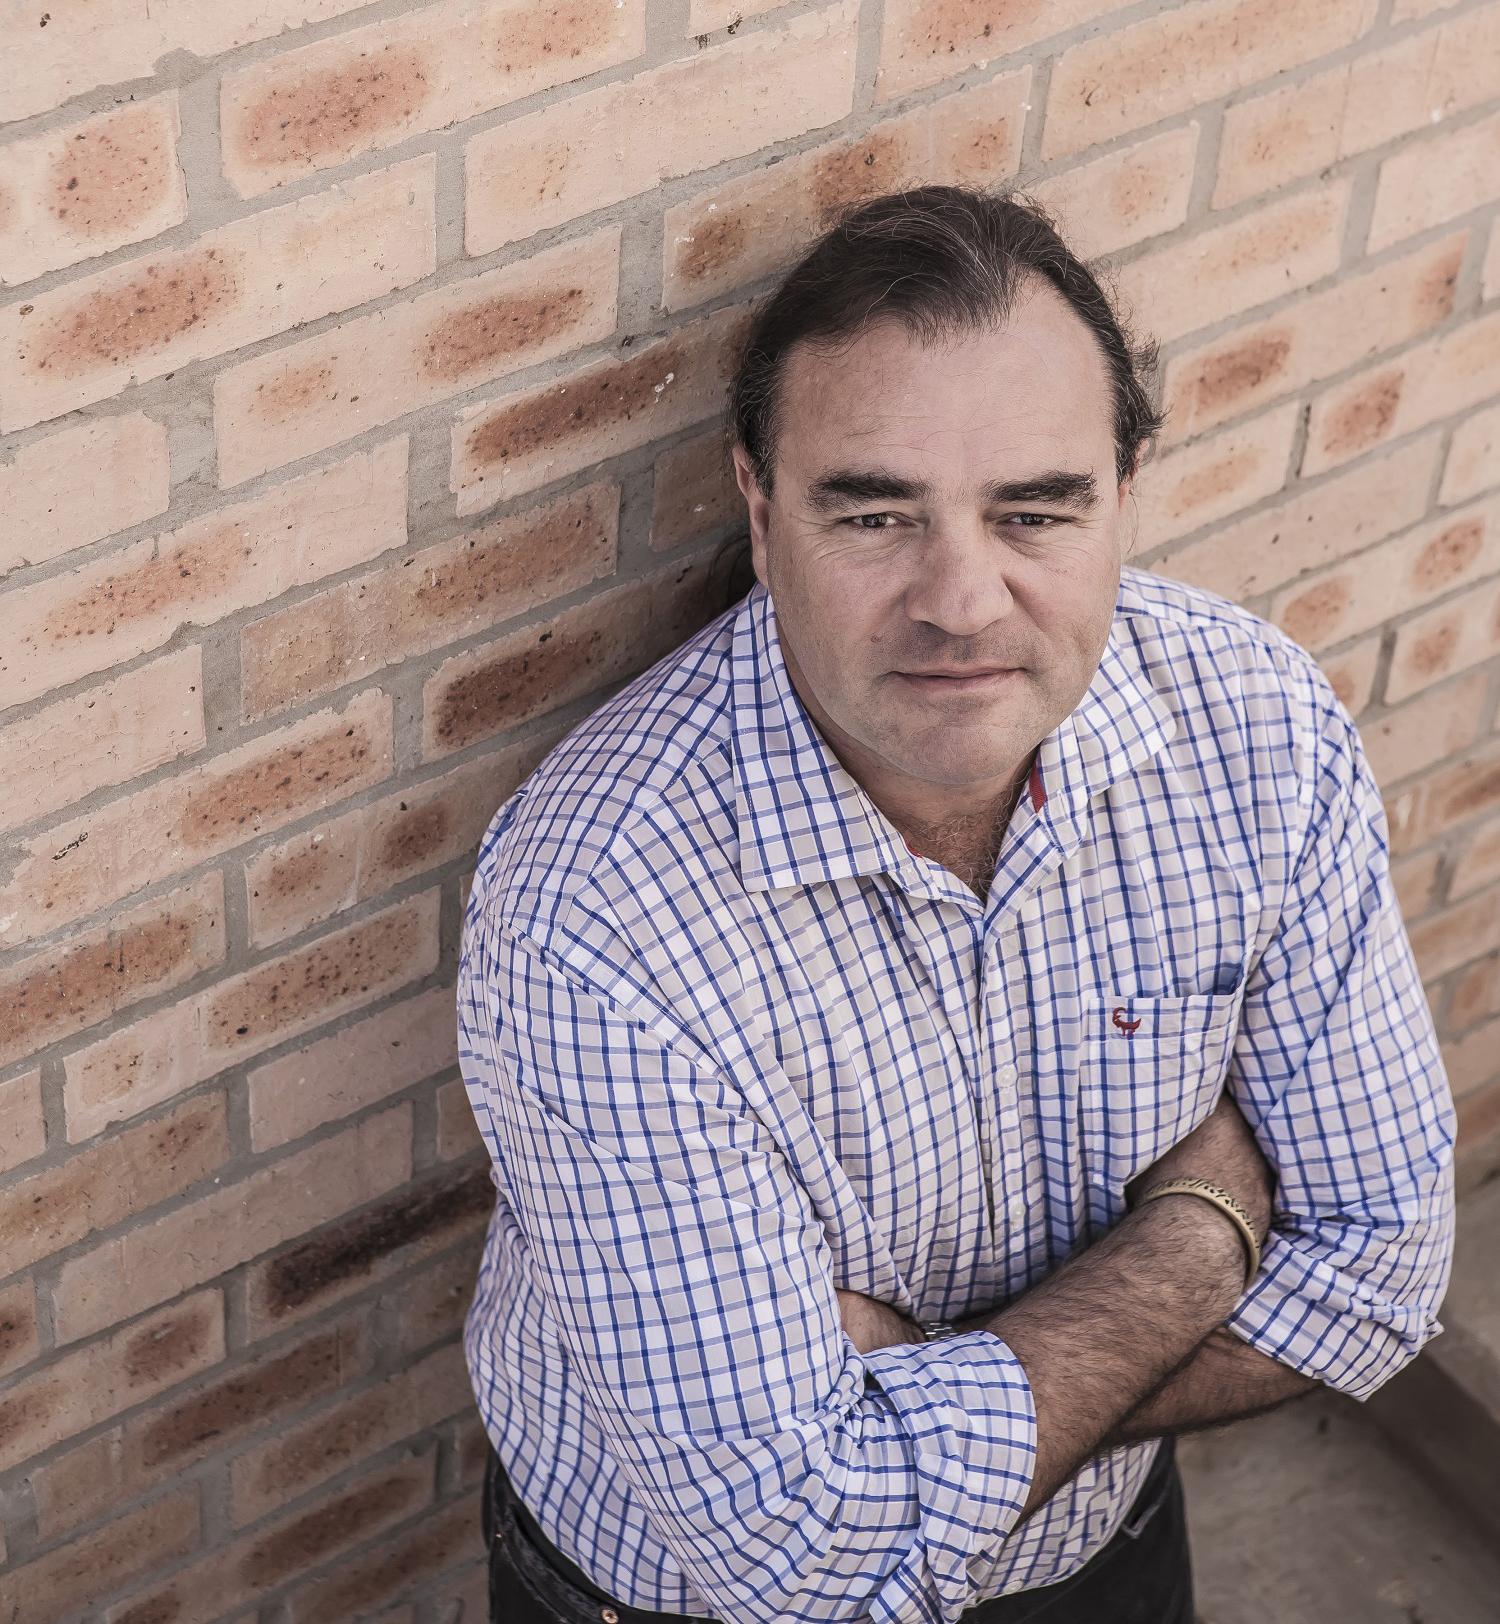 Image: Netshield South Africa CEO Inus Dreckmeyr